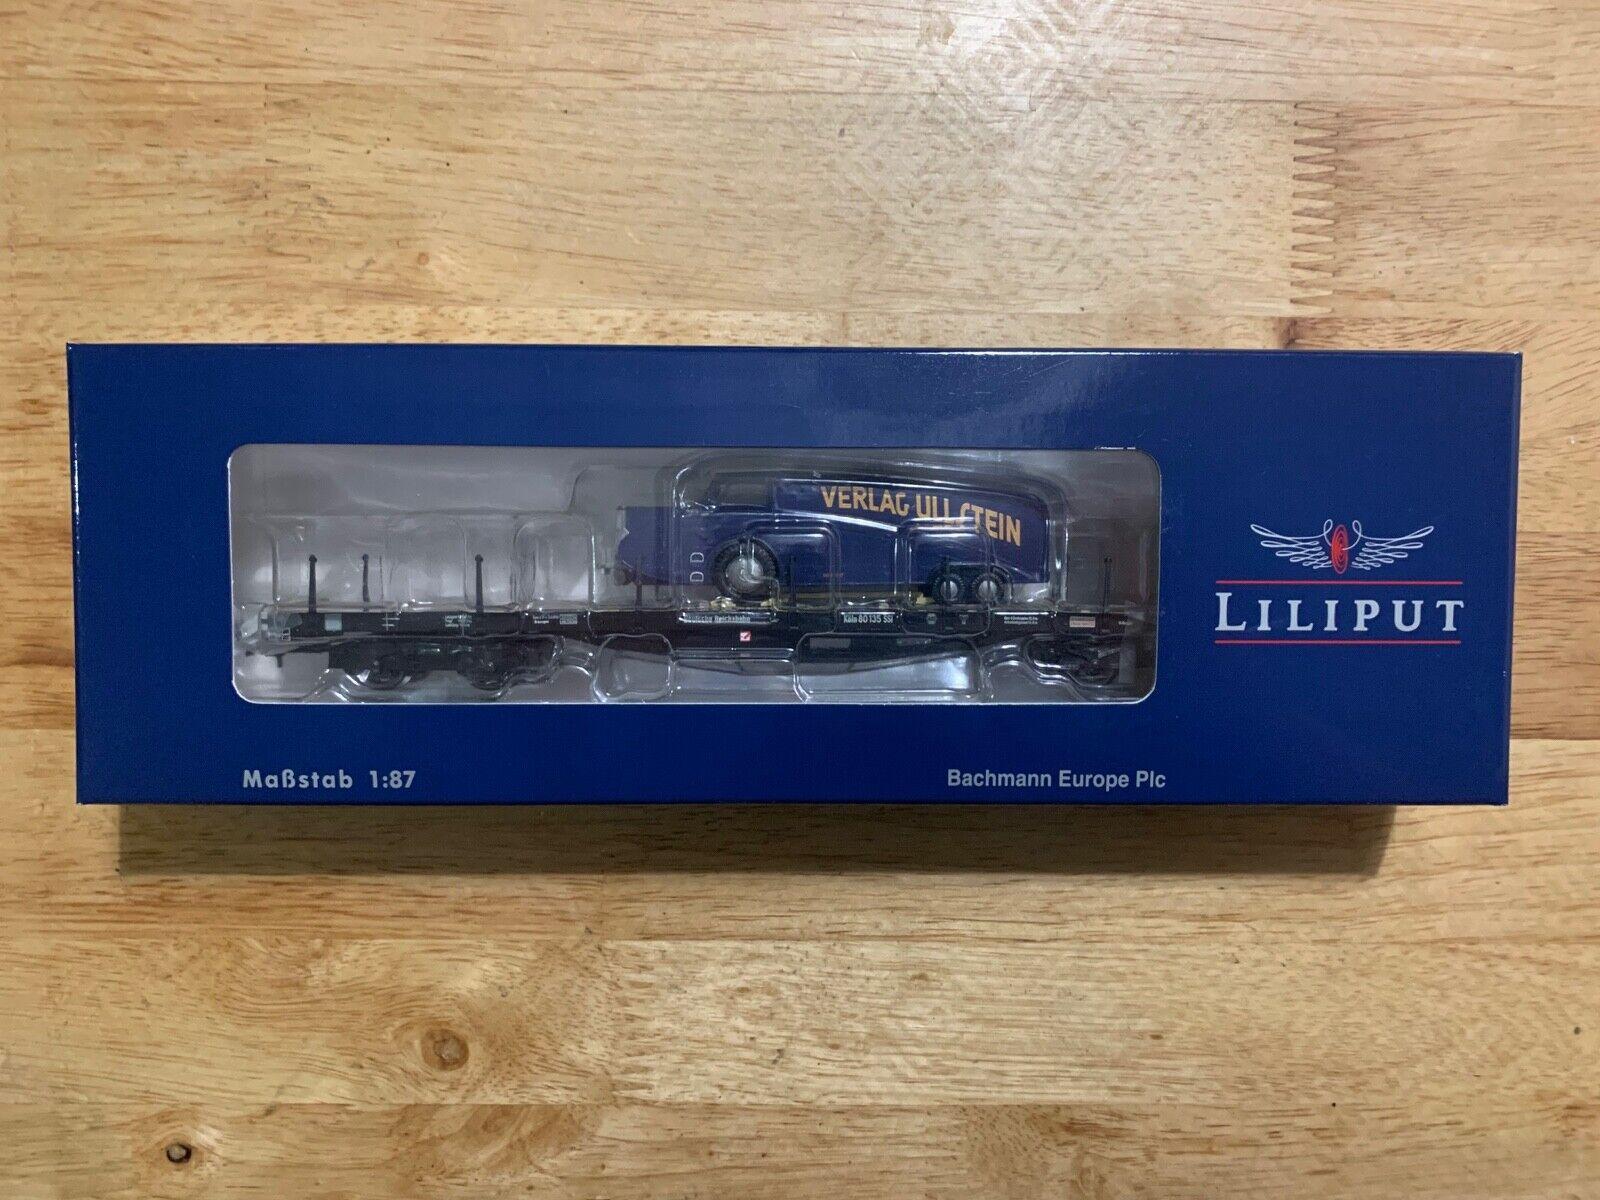 Liliput L235750 Flat Wagon with Brakeuomo's CabRumpler DR Epoch 2